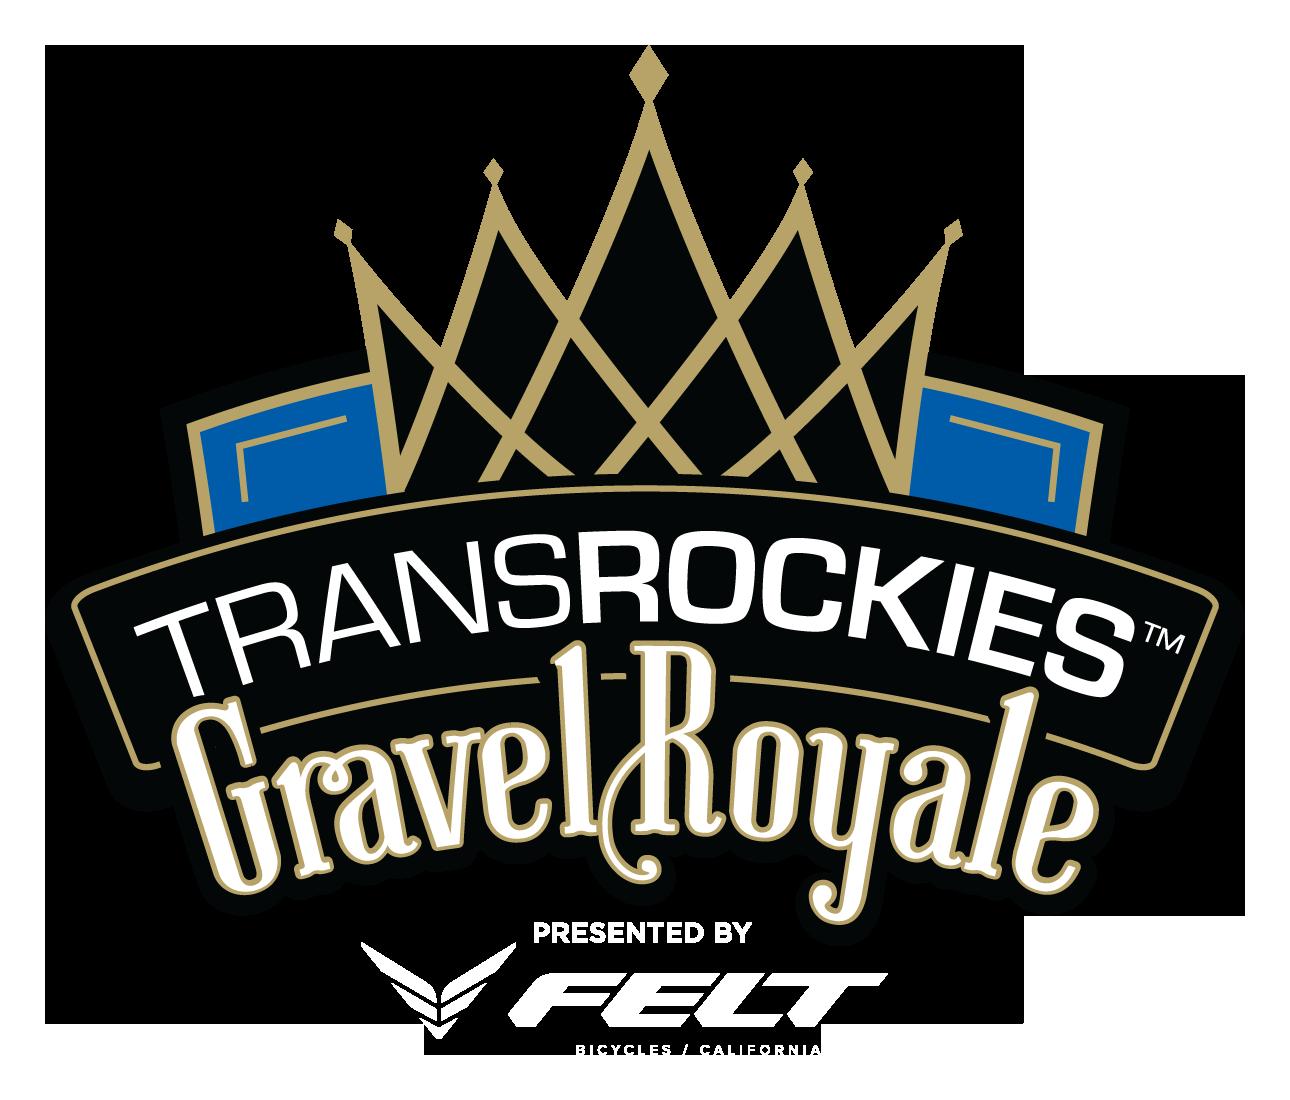 TransRockies Gravel Royale – Bike race or ride through BC, Canada